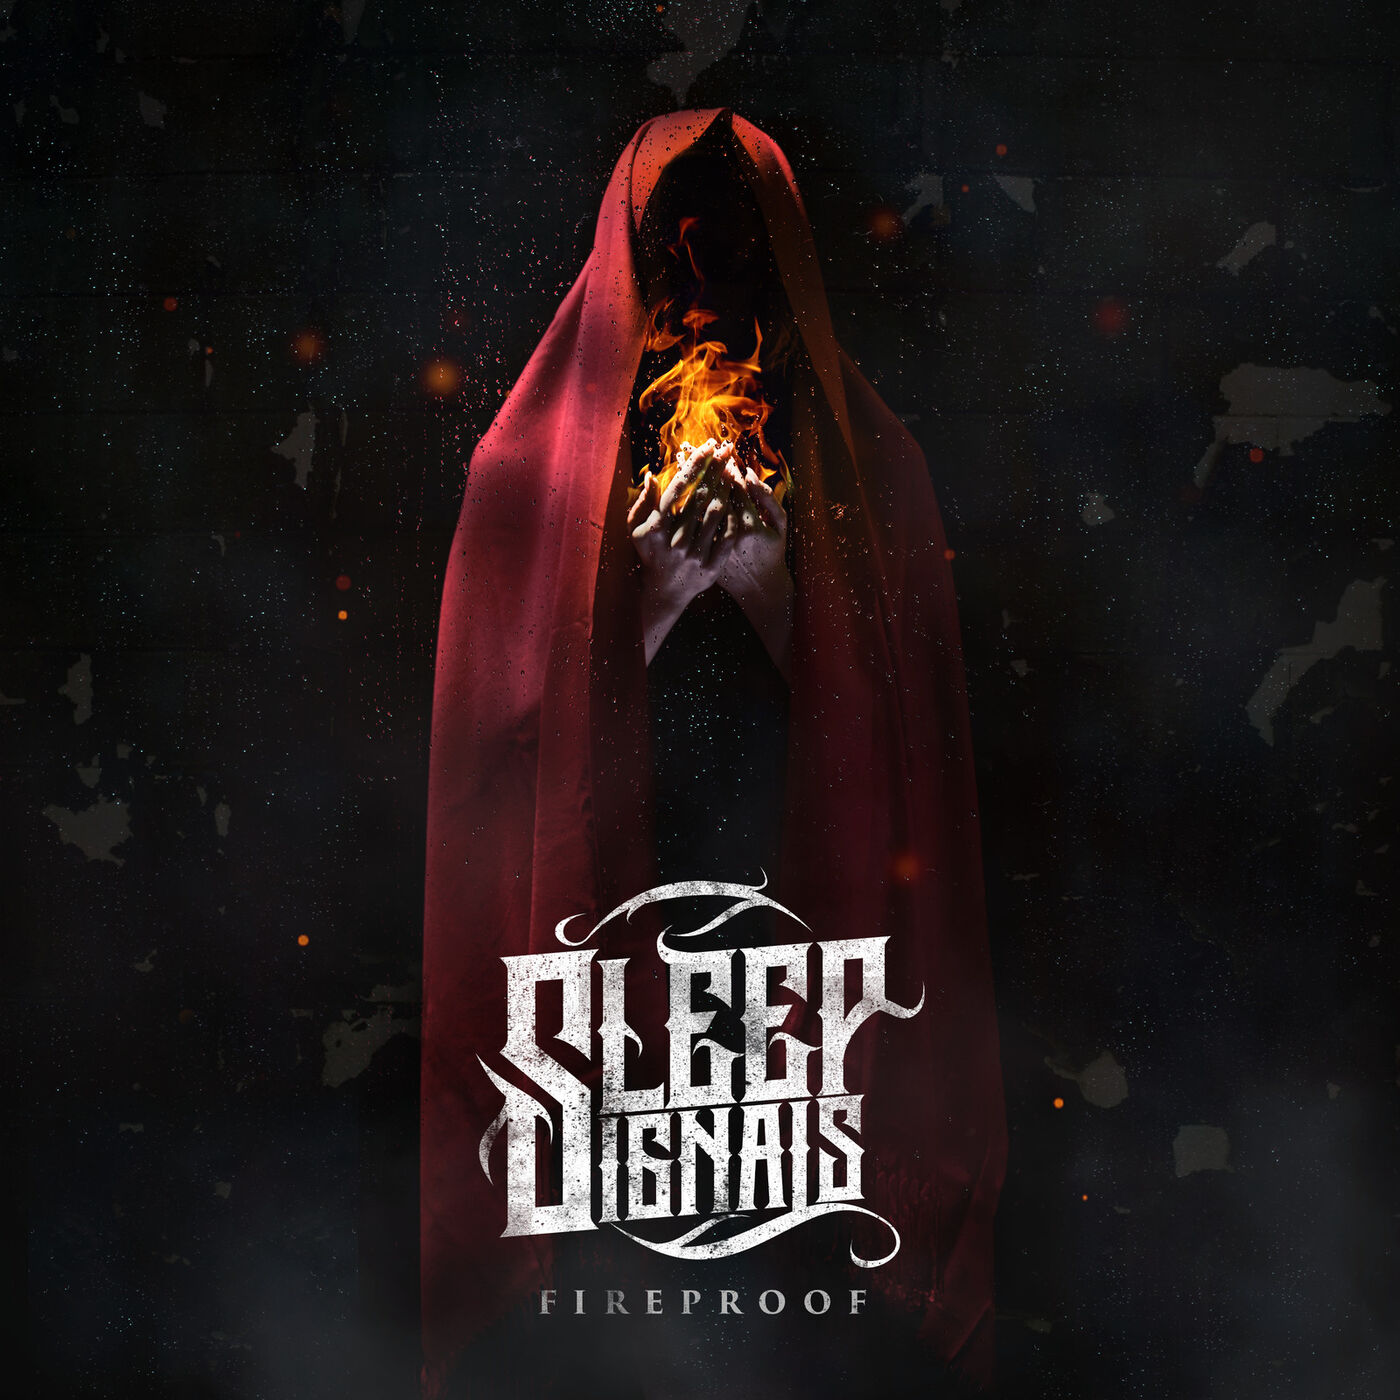 Sleep Signals - Fireproof [single] (2020)